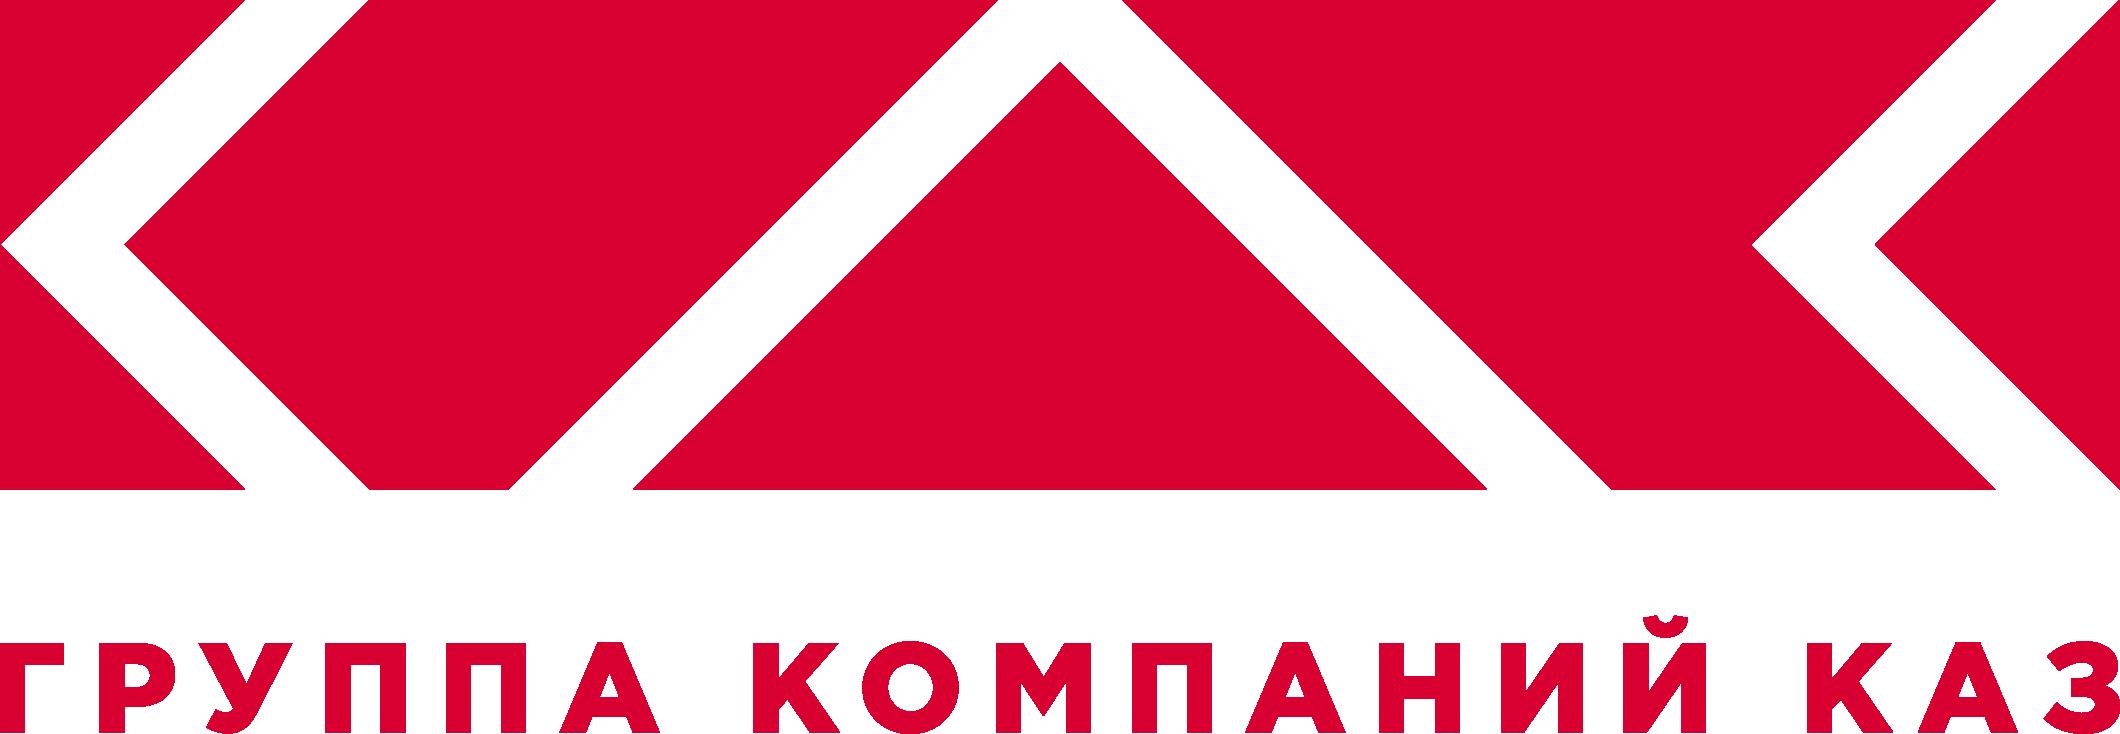 Группа компаний «КАЗ»